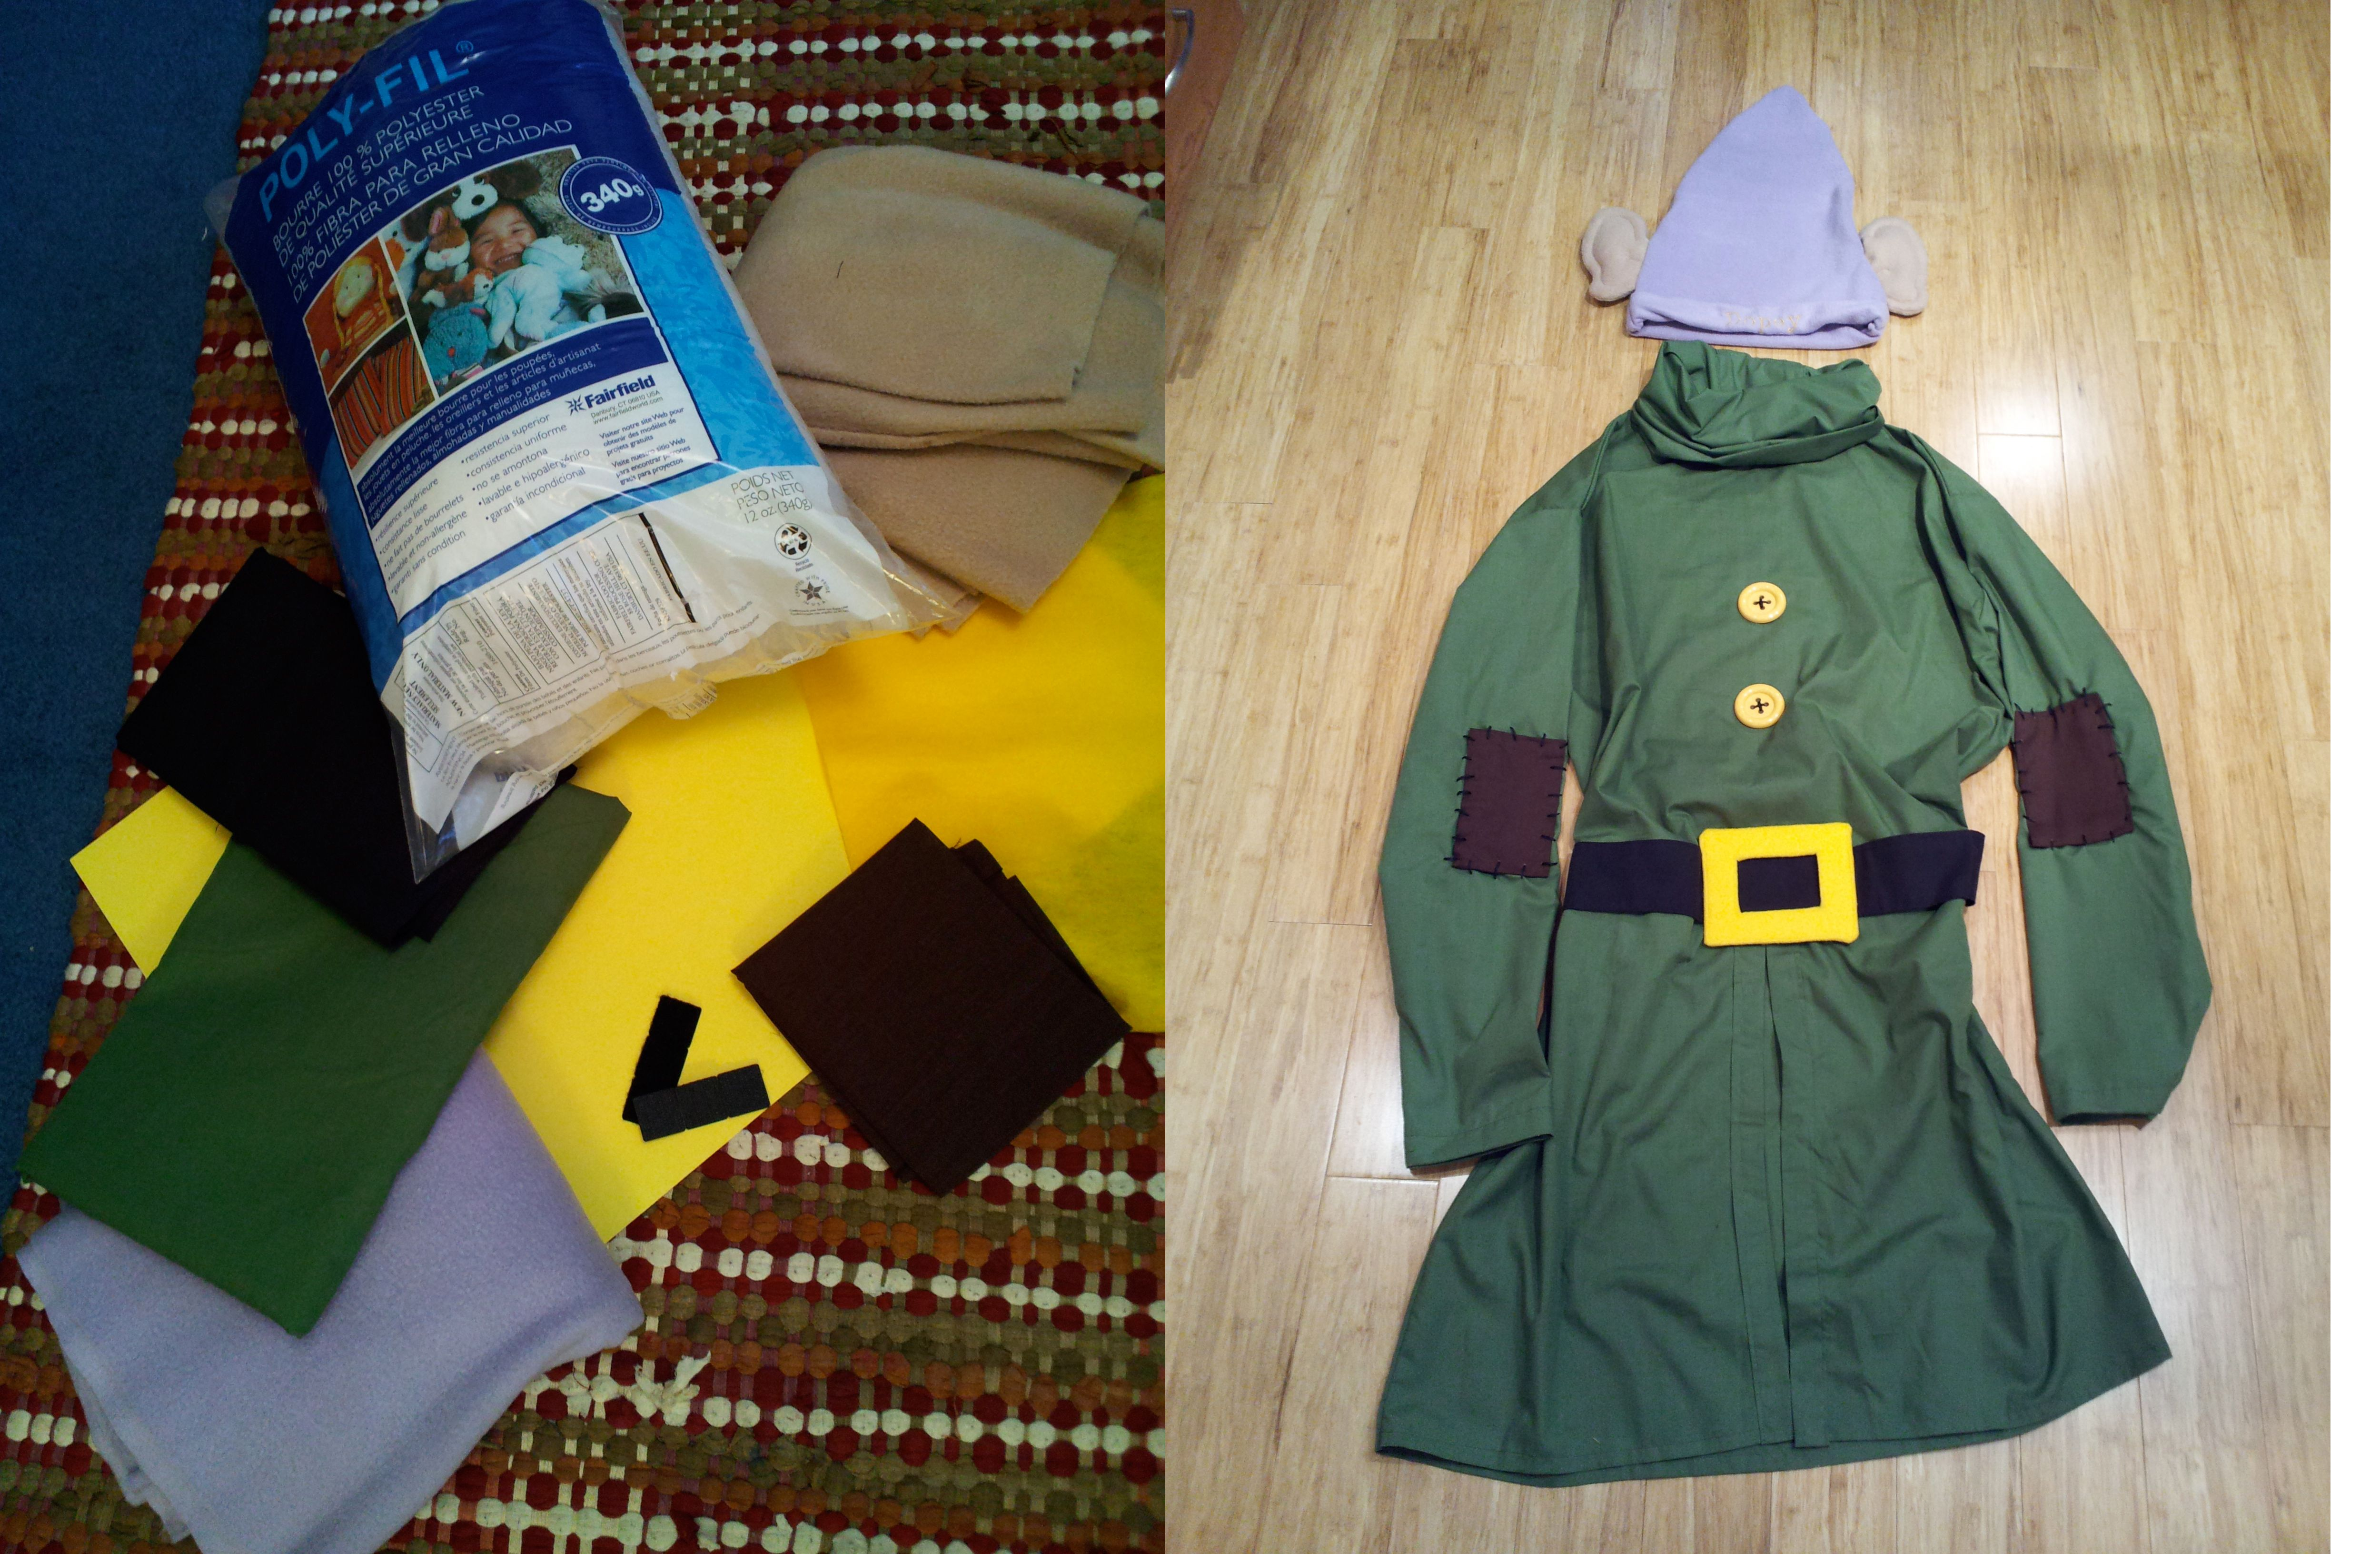 Adult Dopey costume I made 2012 - Kristine & Adult Dopey costume I made 2012 - Kristine | For the kids ...